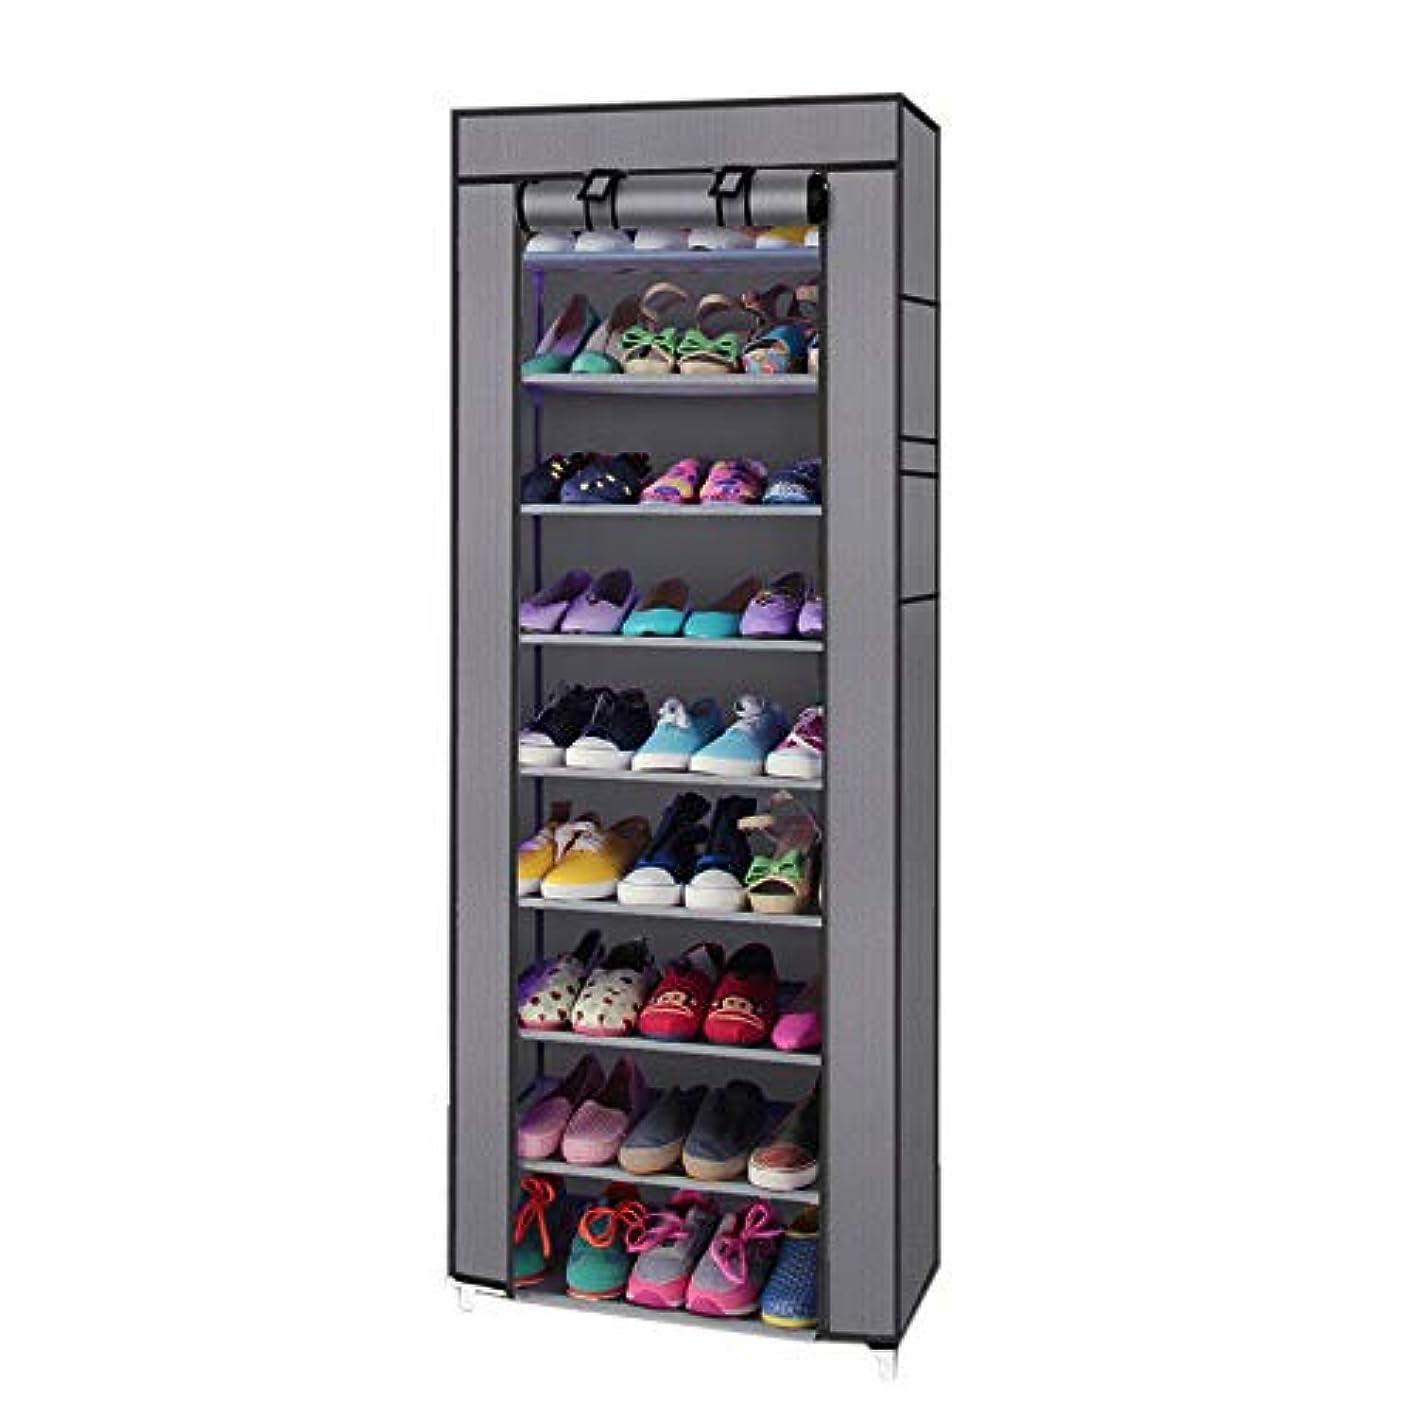 ANA Store 10 Layer Footwear Gray Cabinet 9 Grid Shoe Rack Shelf Dustproof Cover Closet Portable Organizer Shelf Stand